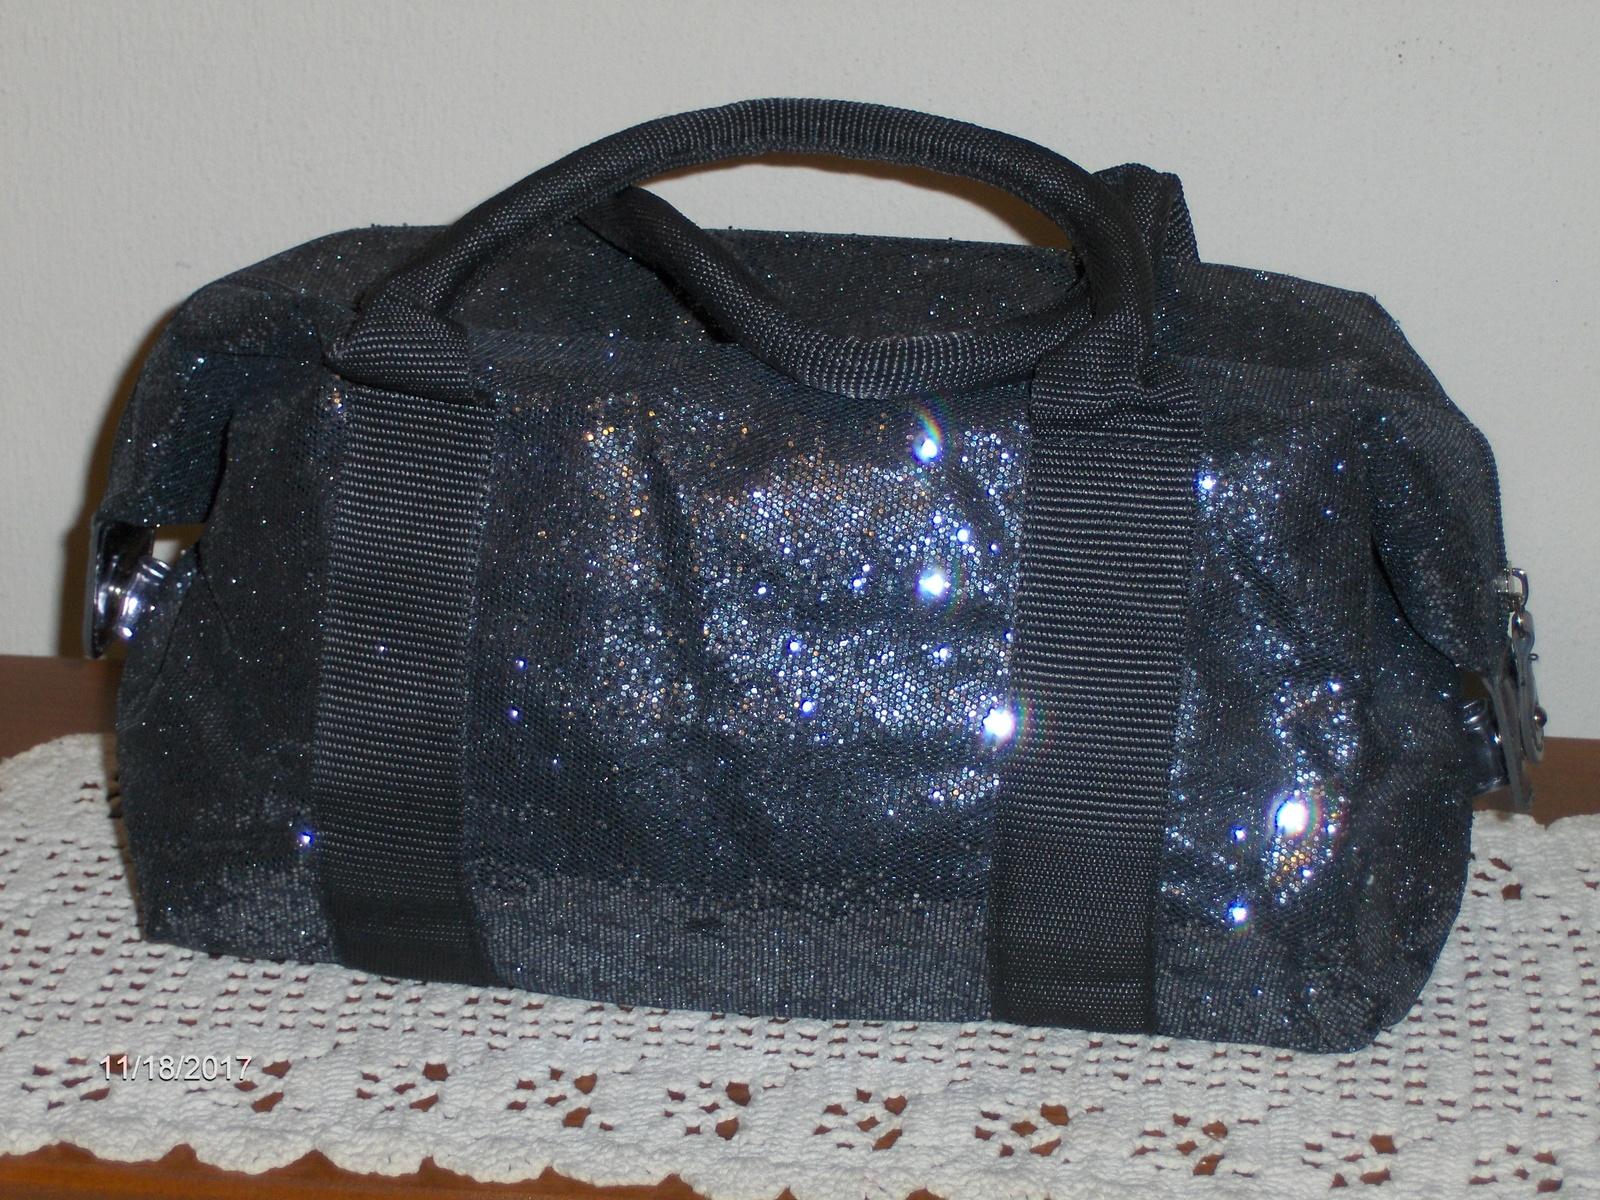 ... Victoria s Secret Satchel Metallic Silver Sparkle Purse Tote Handbag  Cosmetic ... 5b51b2a7fb